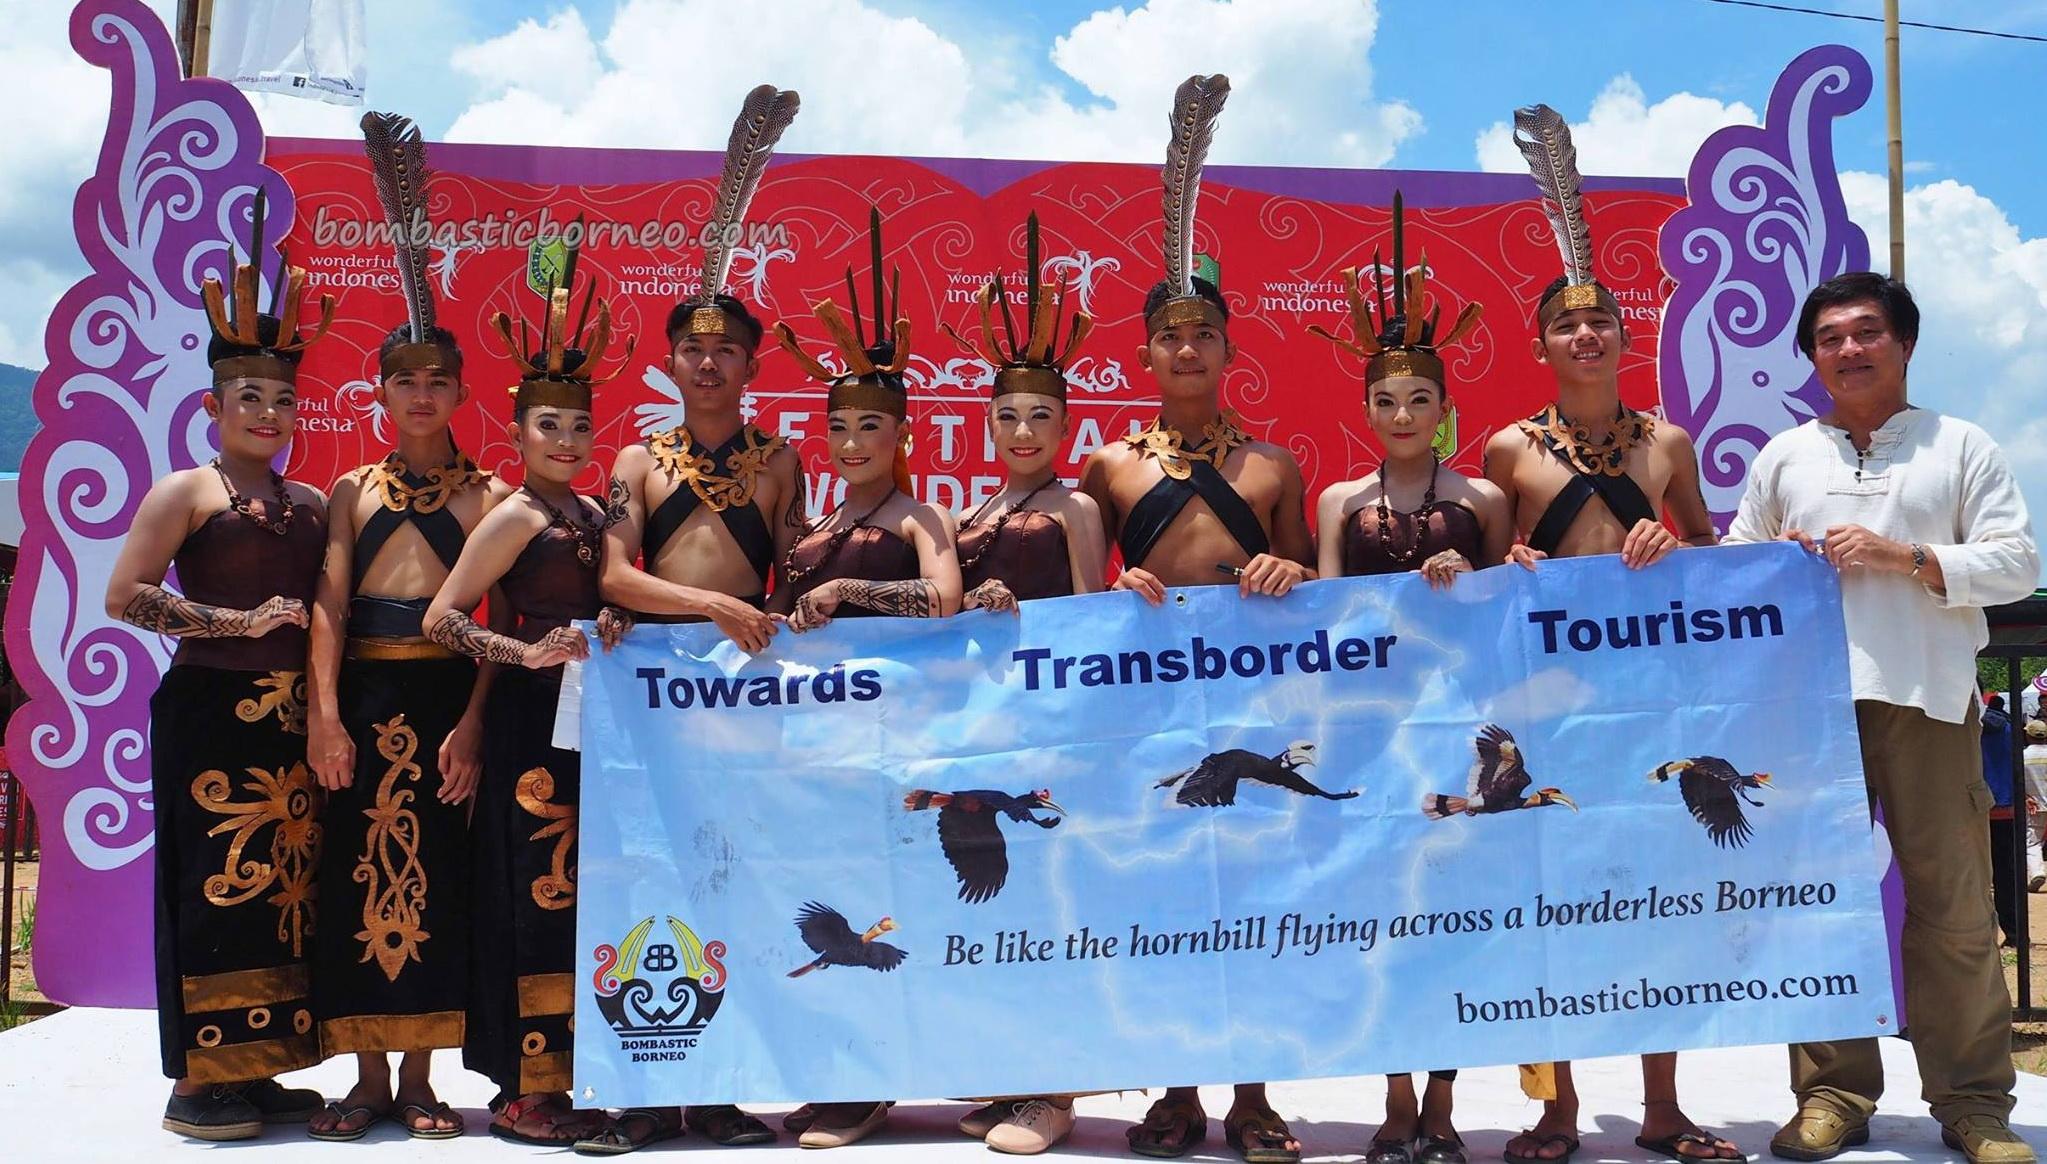 perbatasan, adventure, Biawak-Aruk Border Post, crossborder, transborder, culture, dayak, Tribal, Tribe, native, event, indigenous, Traditional, Sarawak, Sajingan Besar, Sambas, Tourism,